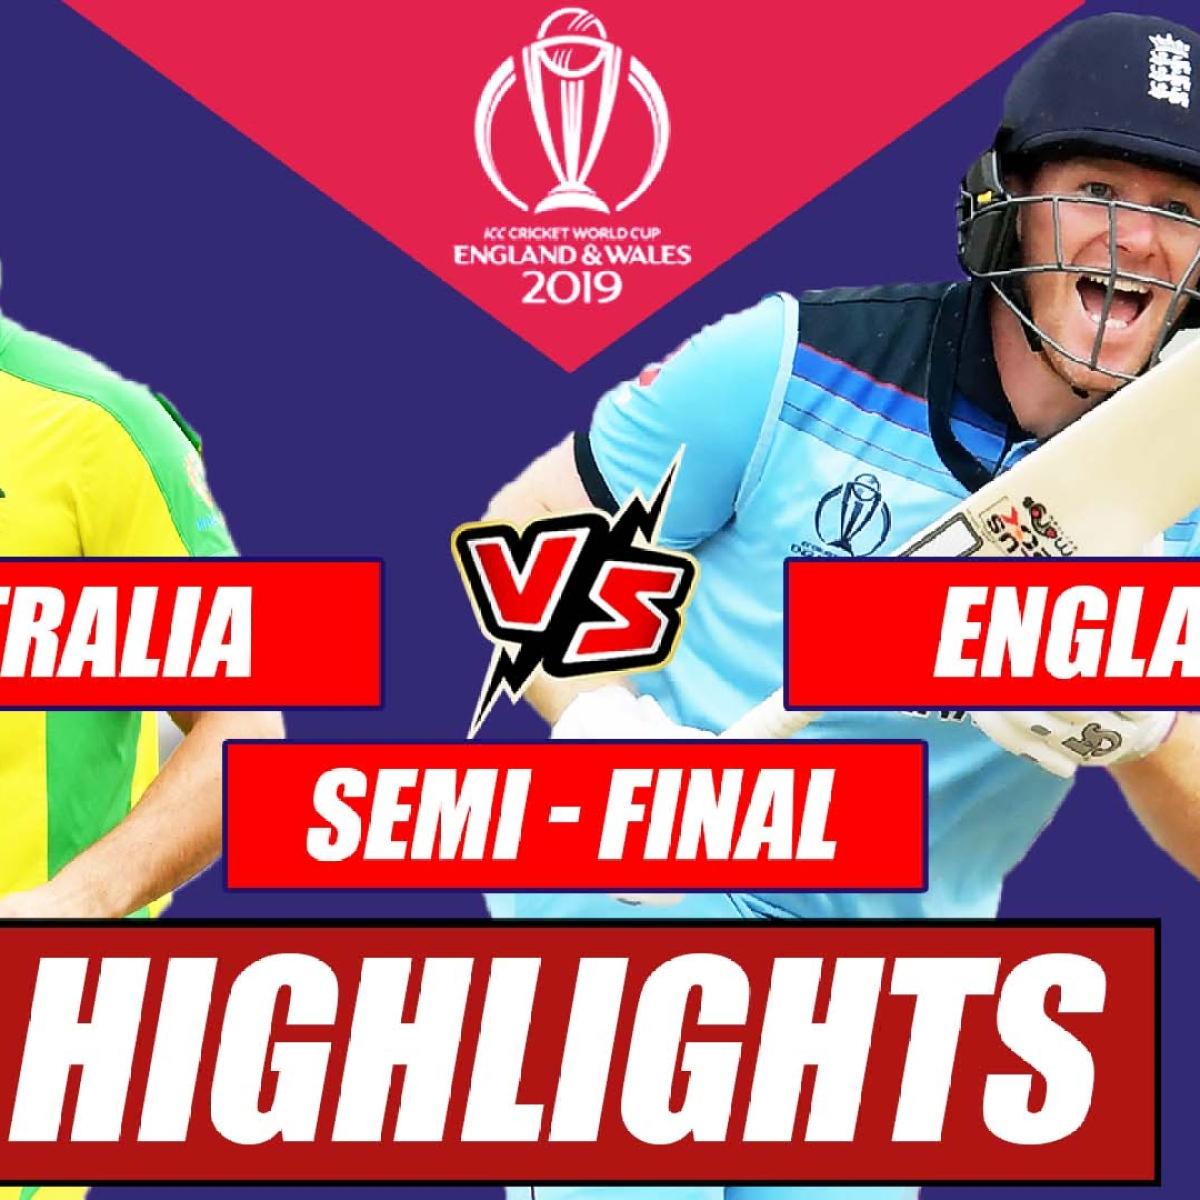 Australia vs England - Semi Final Match Highlights   England Beats Australia By 8 Wickets #CWC2019